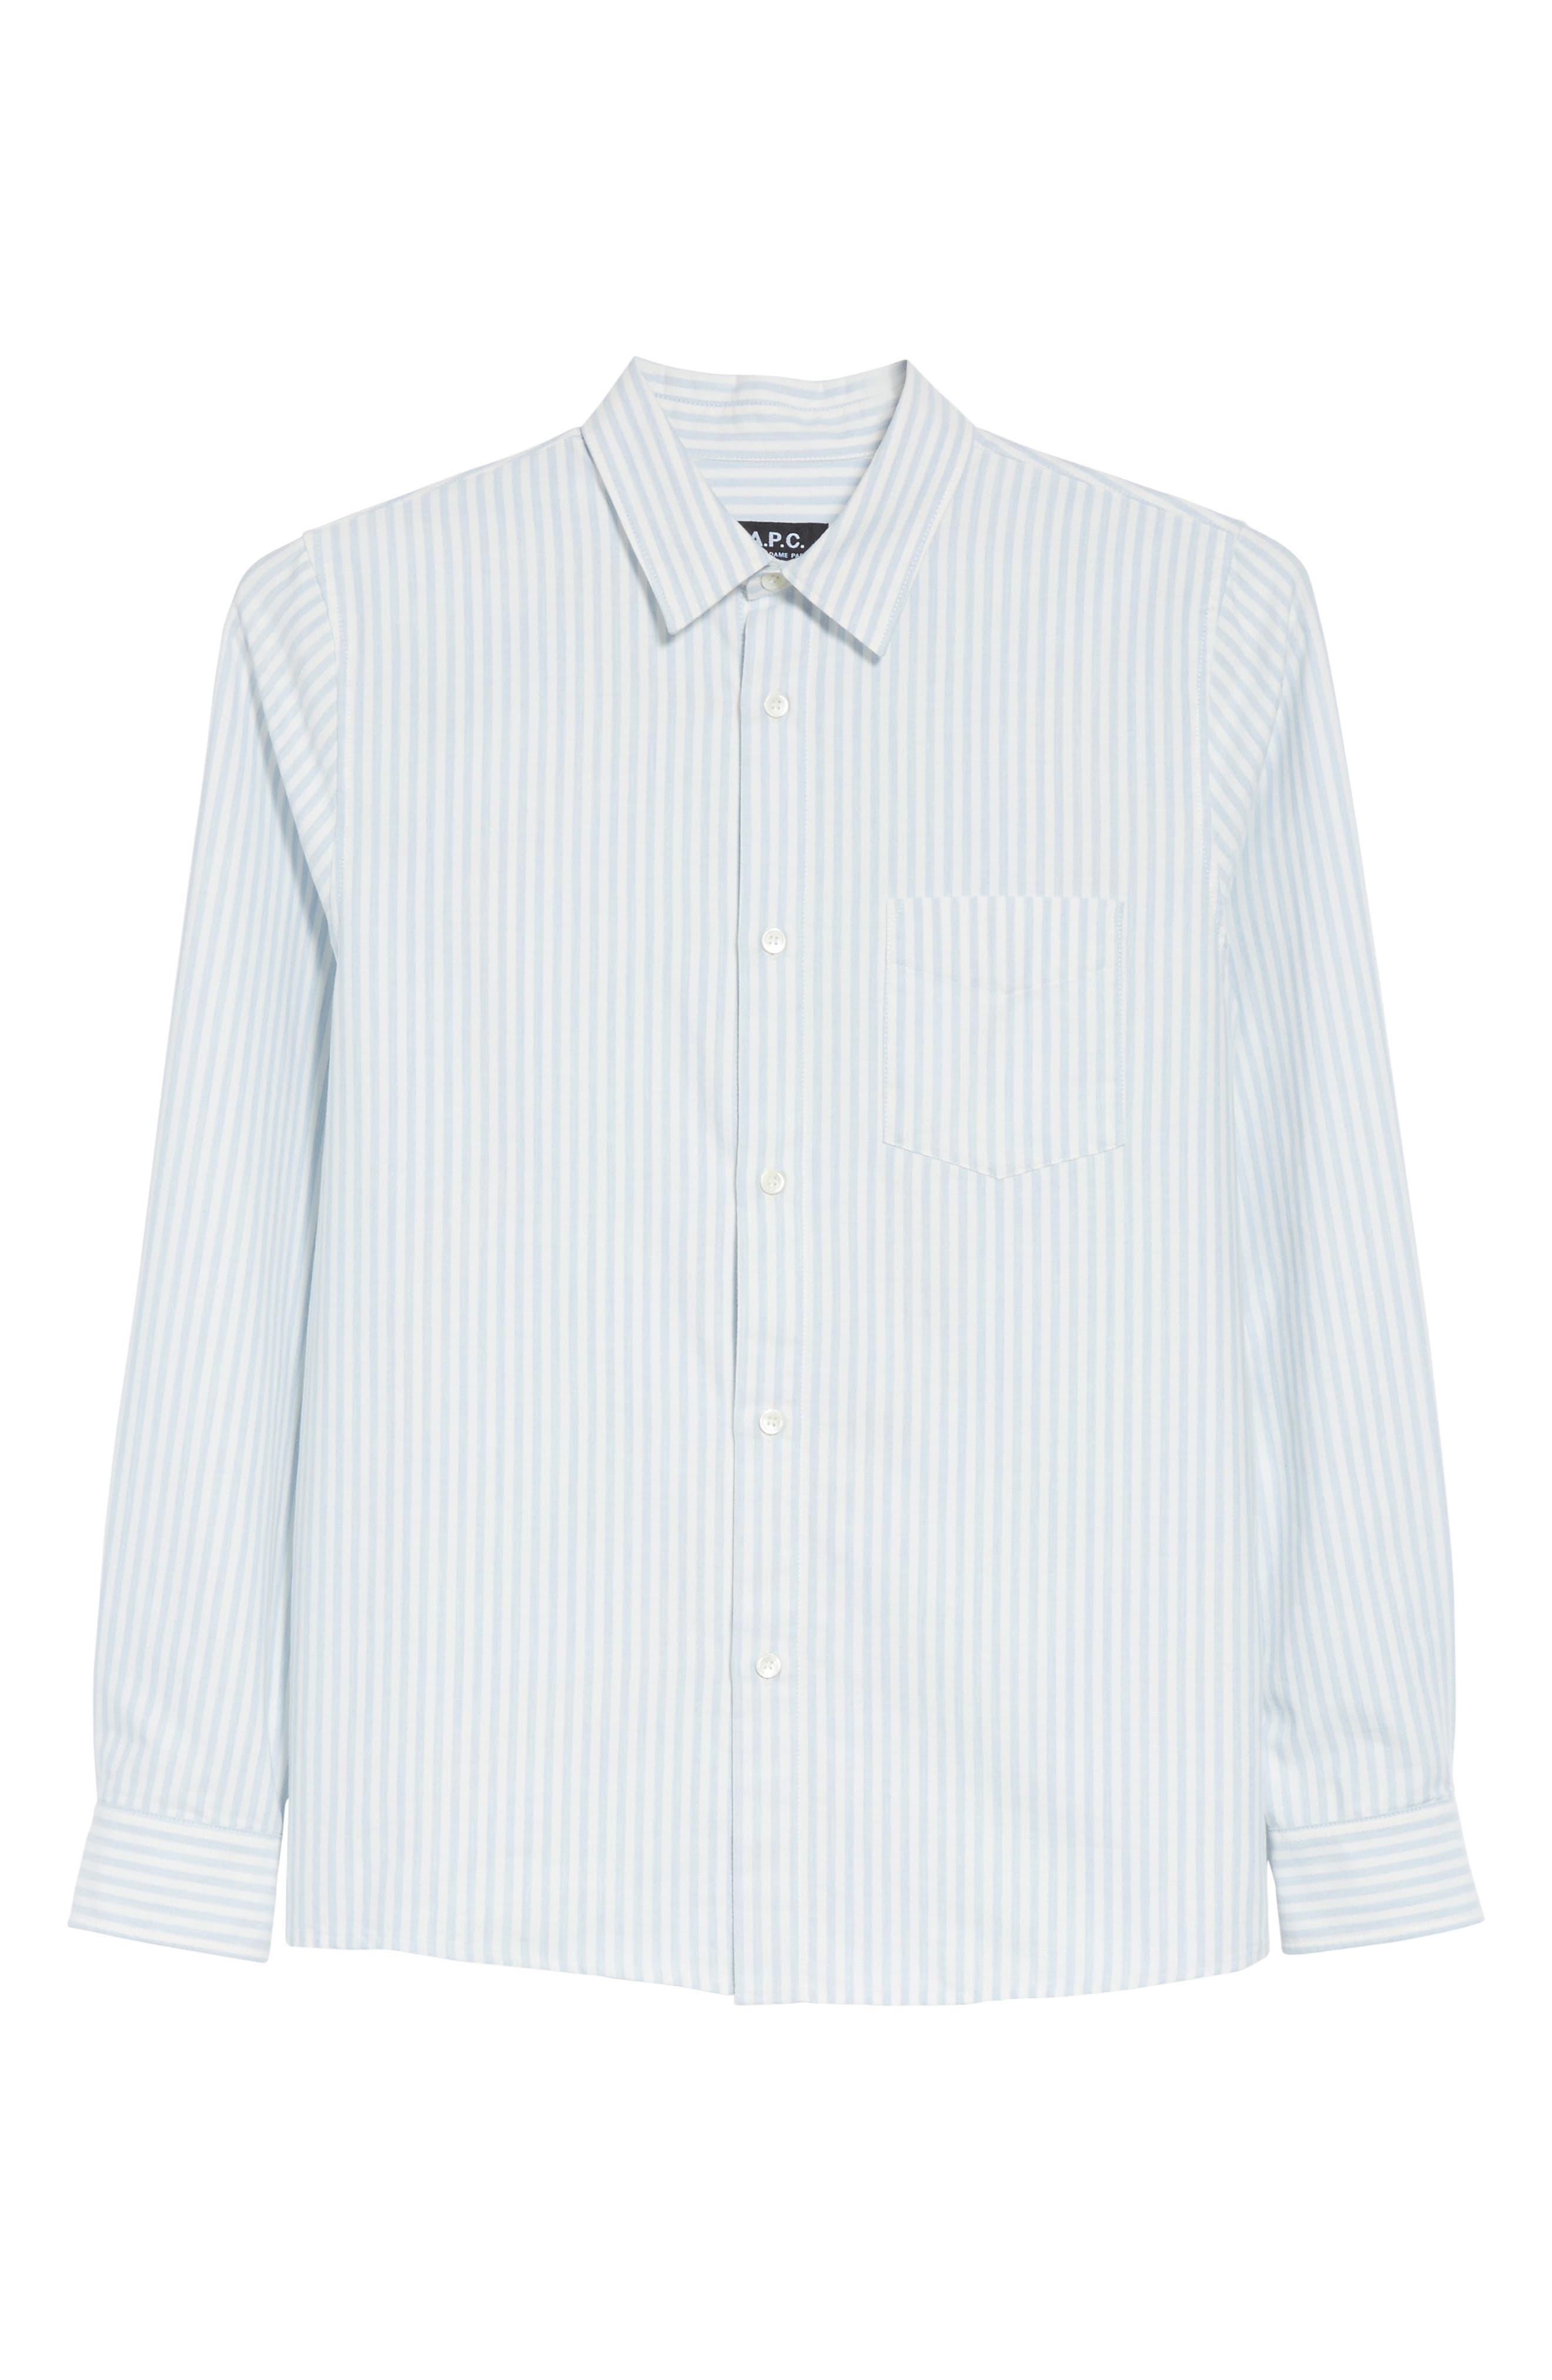 Oliver Stripe Oxford Shirt,                             Alternate thumbnail 6, color,                             430